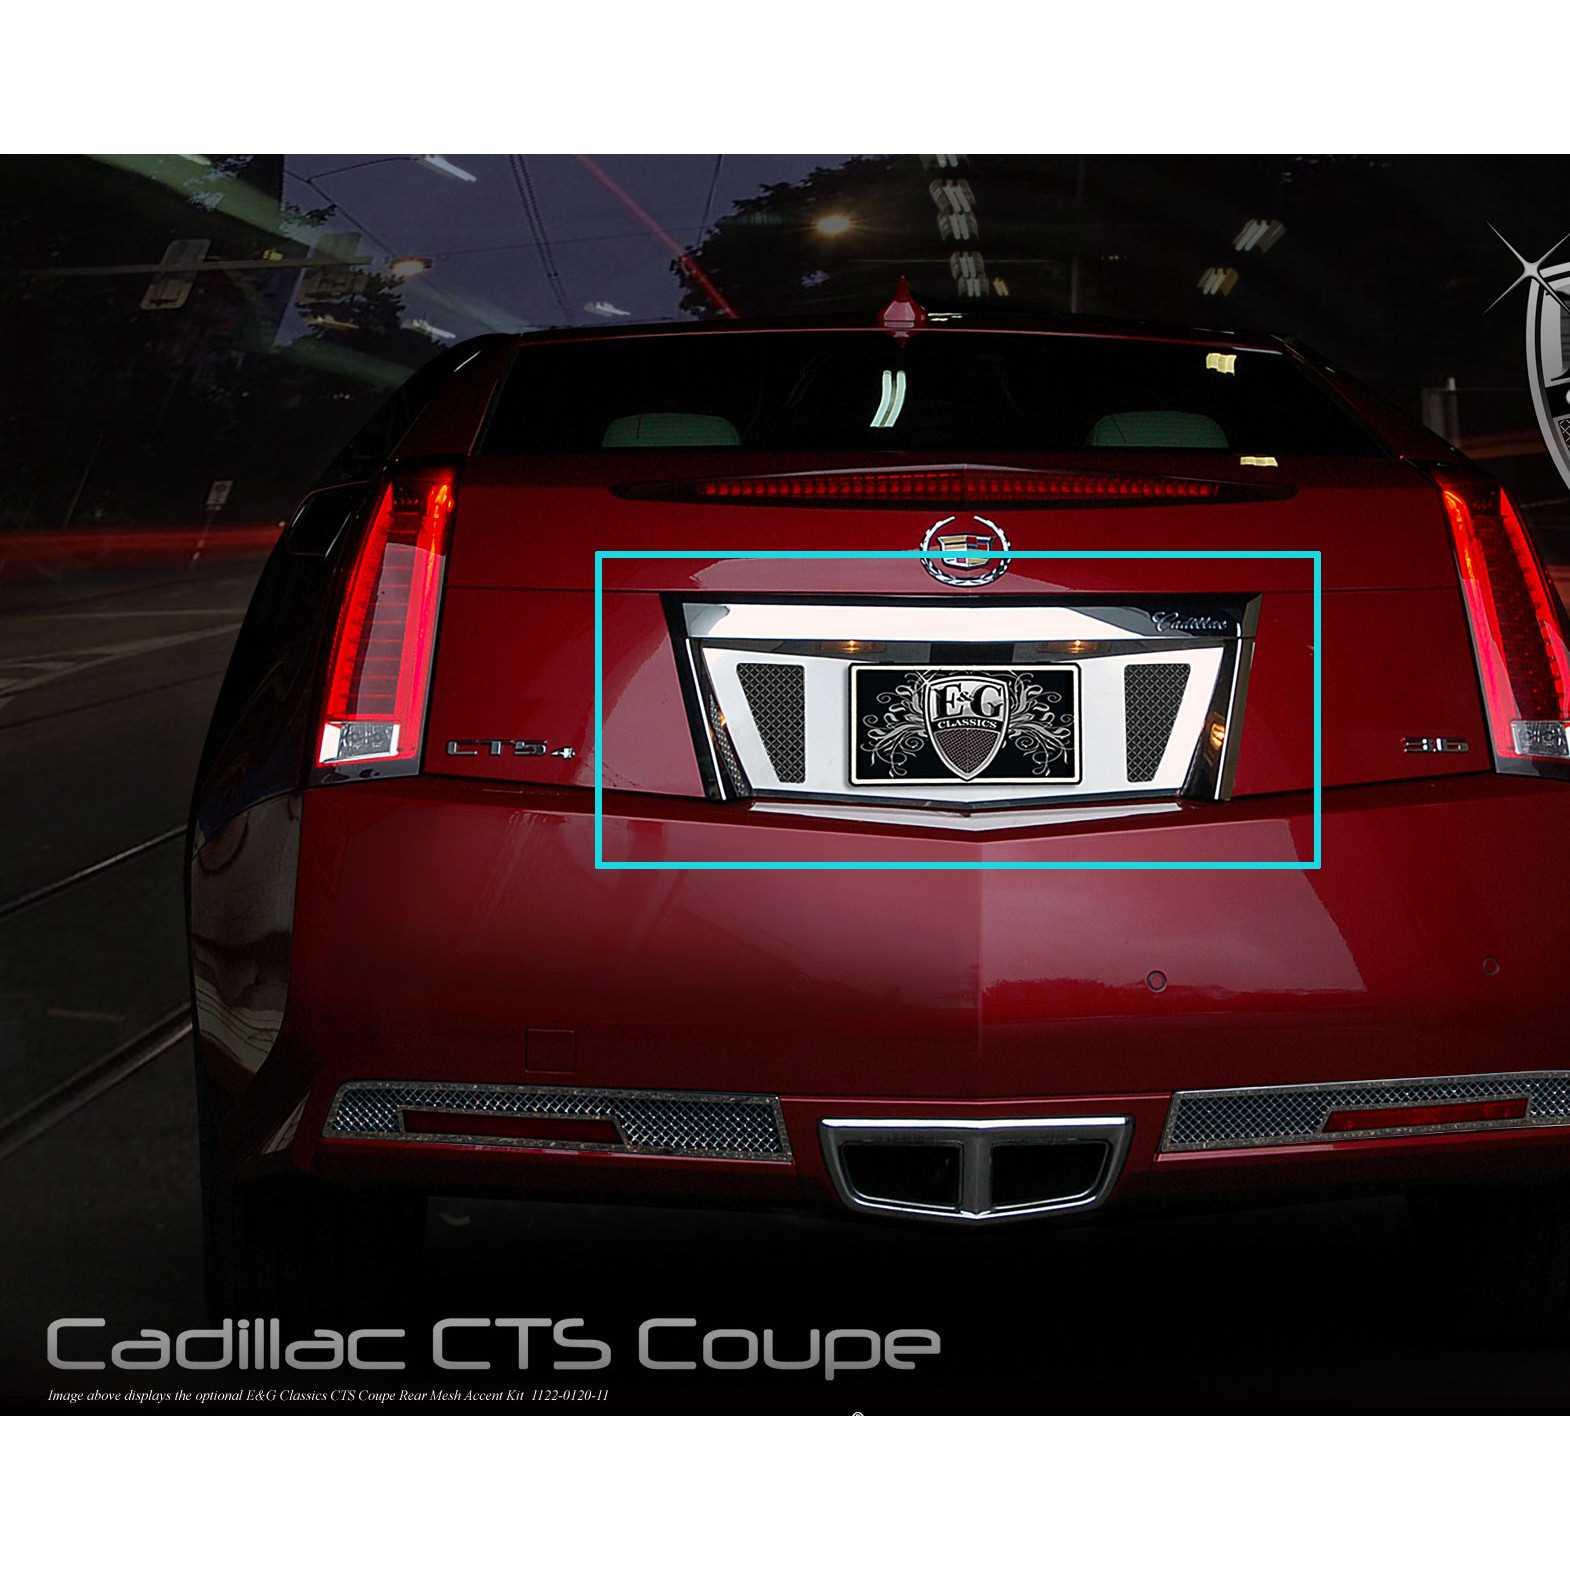 E g classics 2011 2015 cadillac cts accessories coupe rear tag surround w mesh insert black ice 1122 b710 11